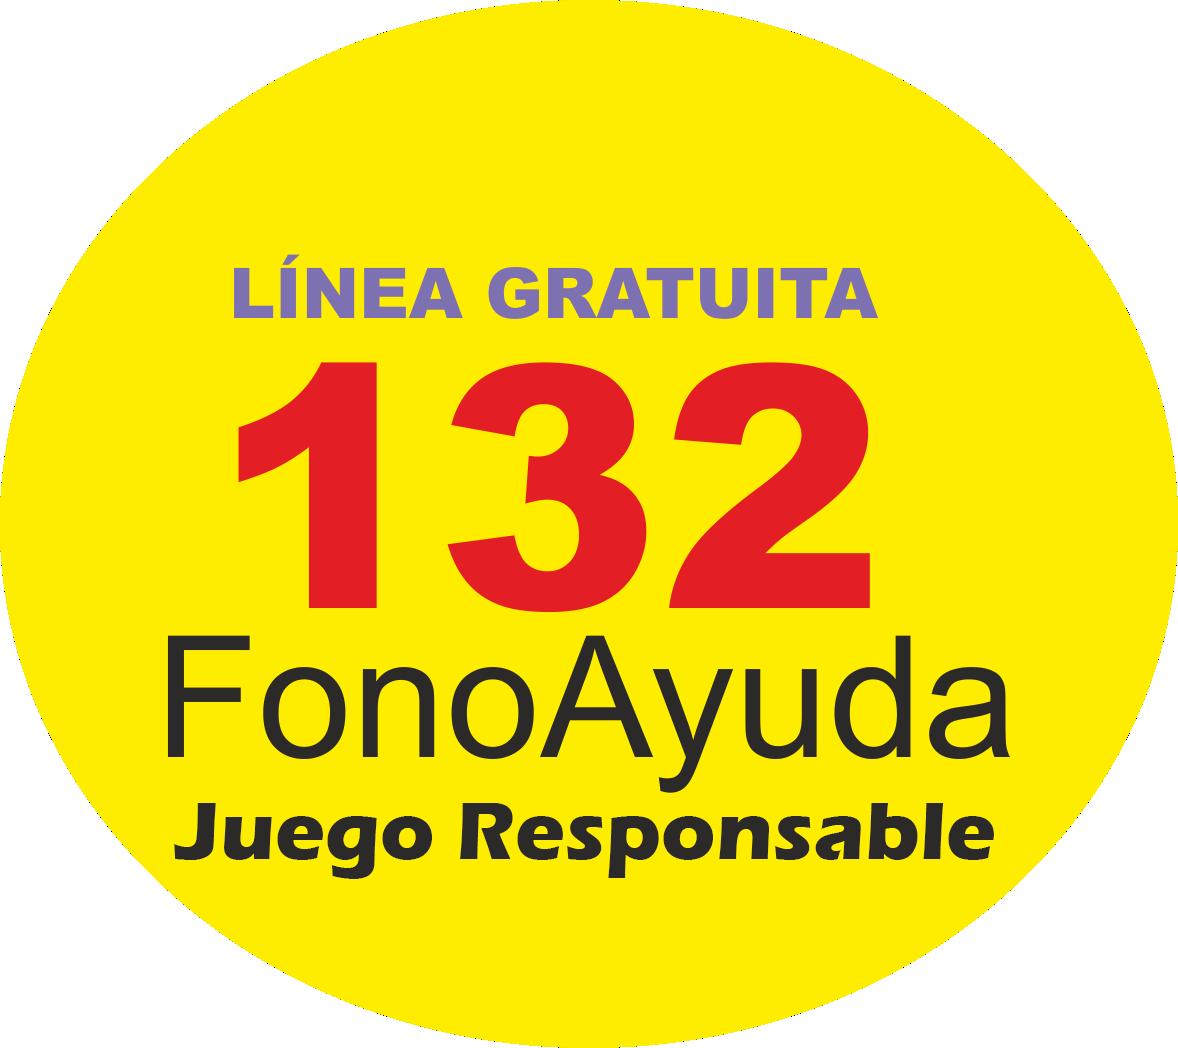 FonoAyuda 132